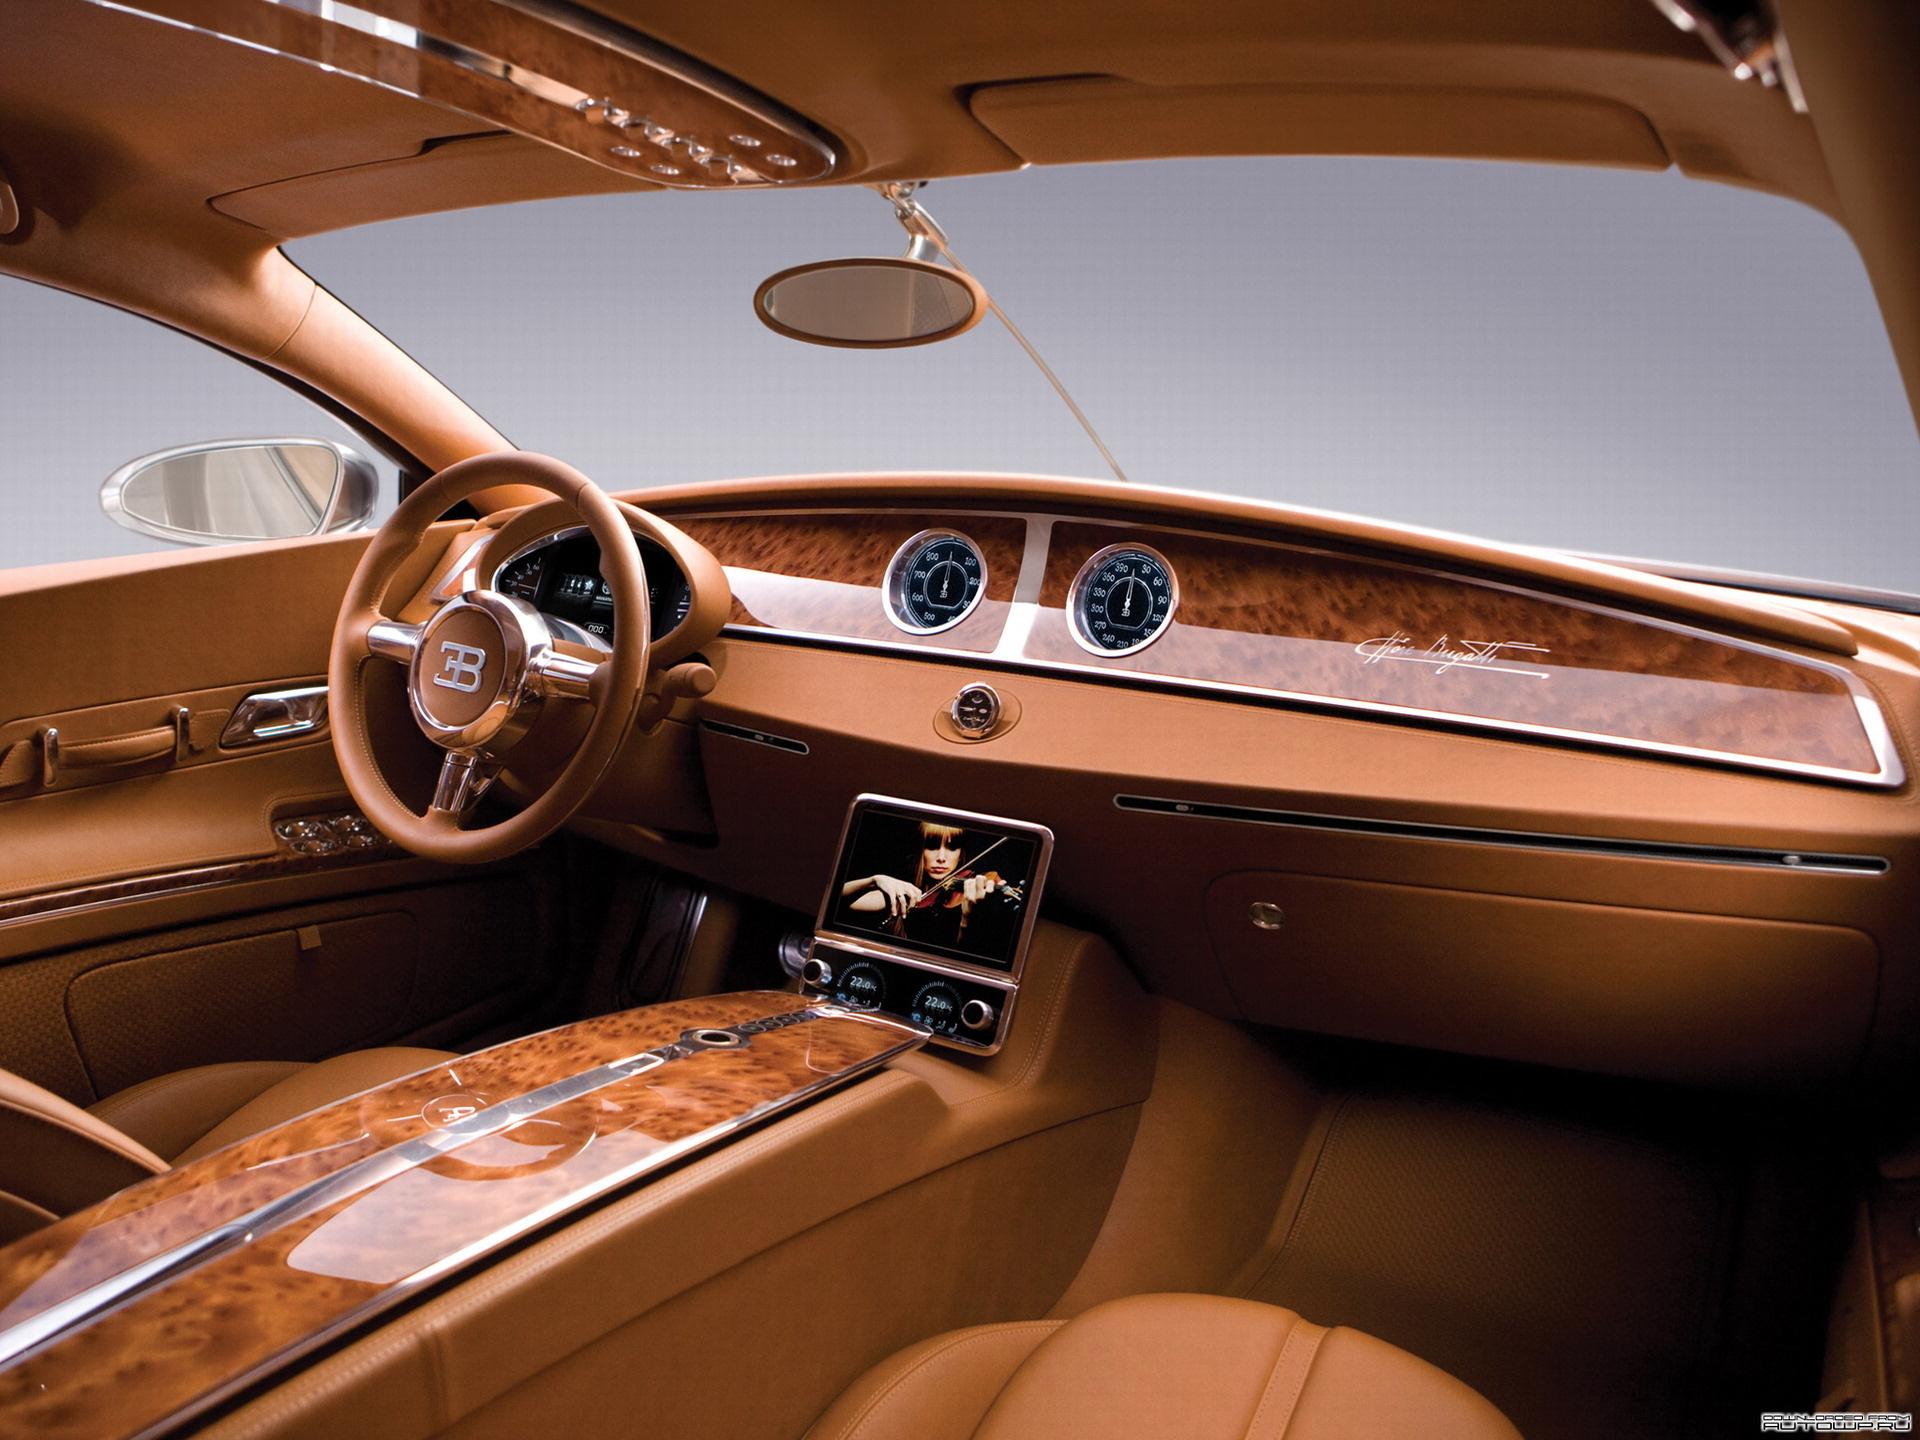 кожанный салон машины, Bugatti veyron, wallpaper